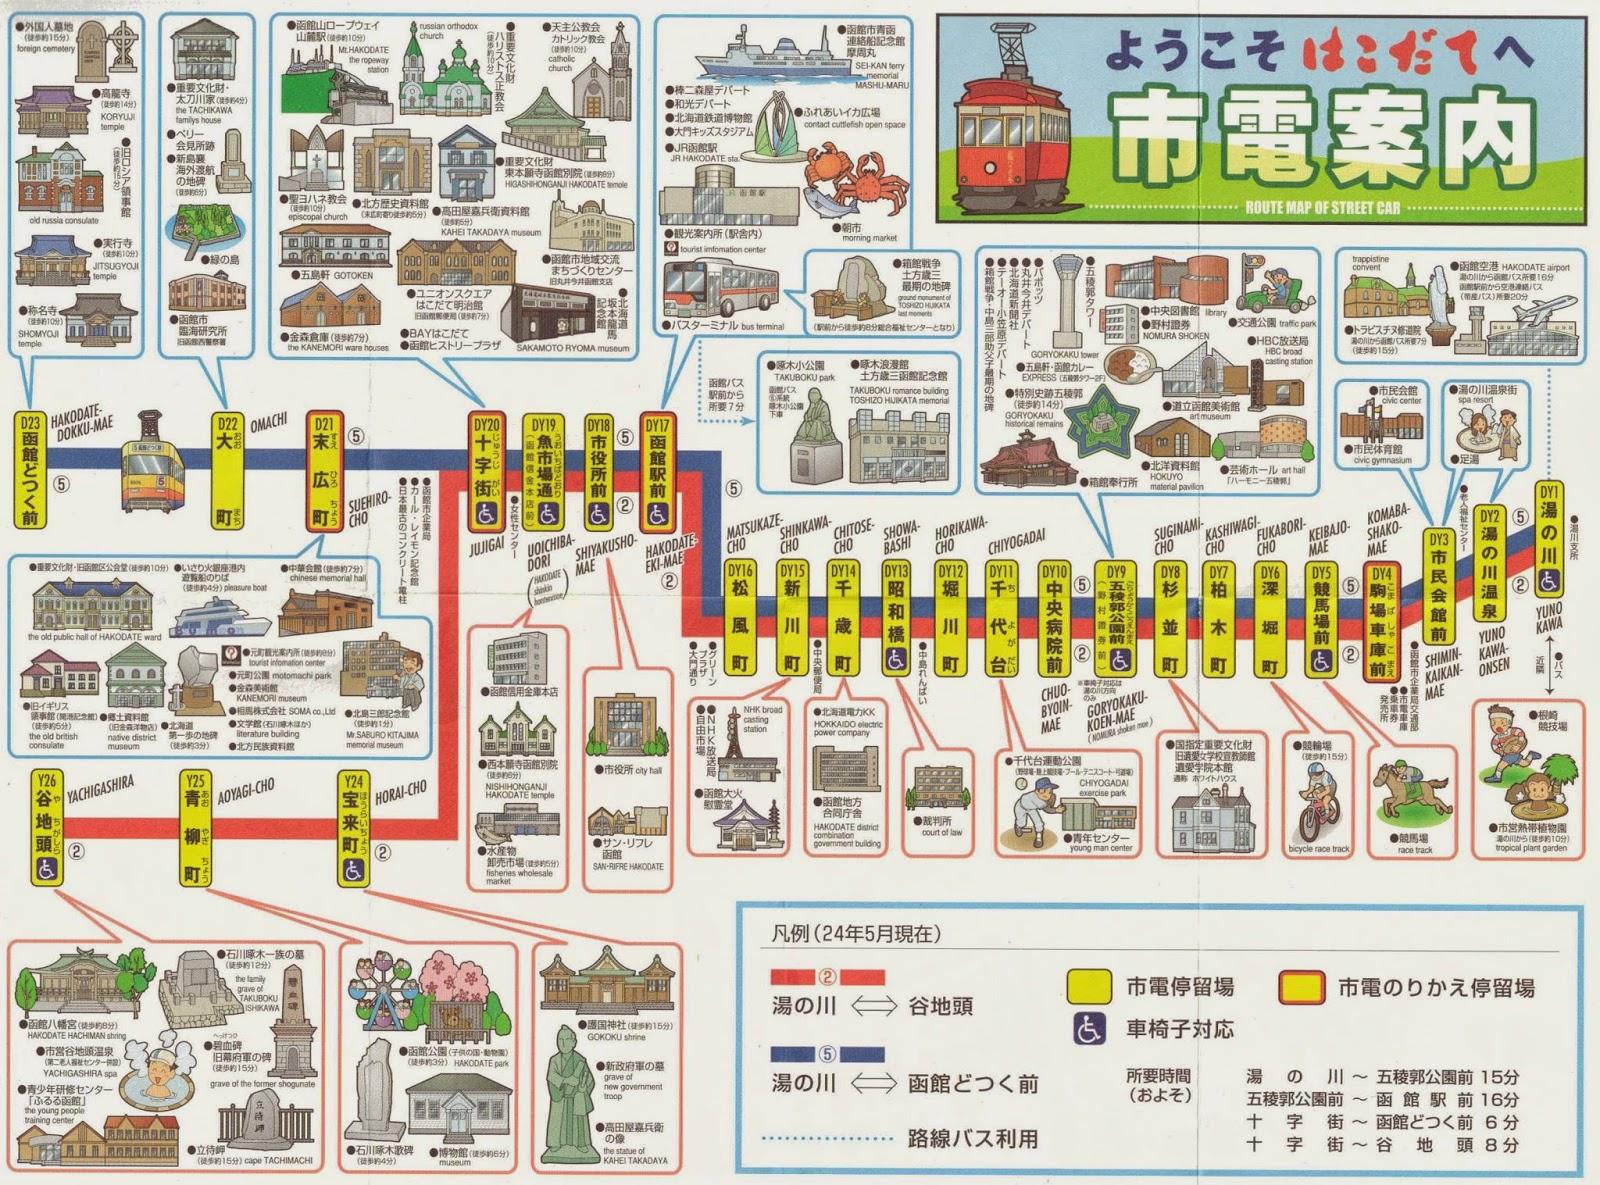 Hiroshima Tram Line Map